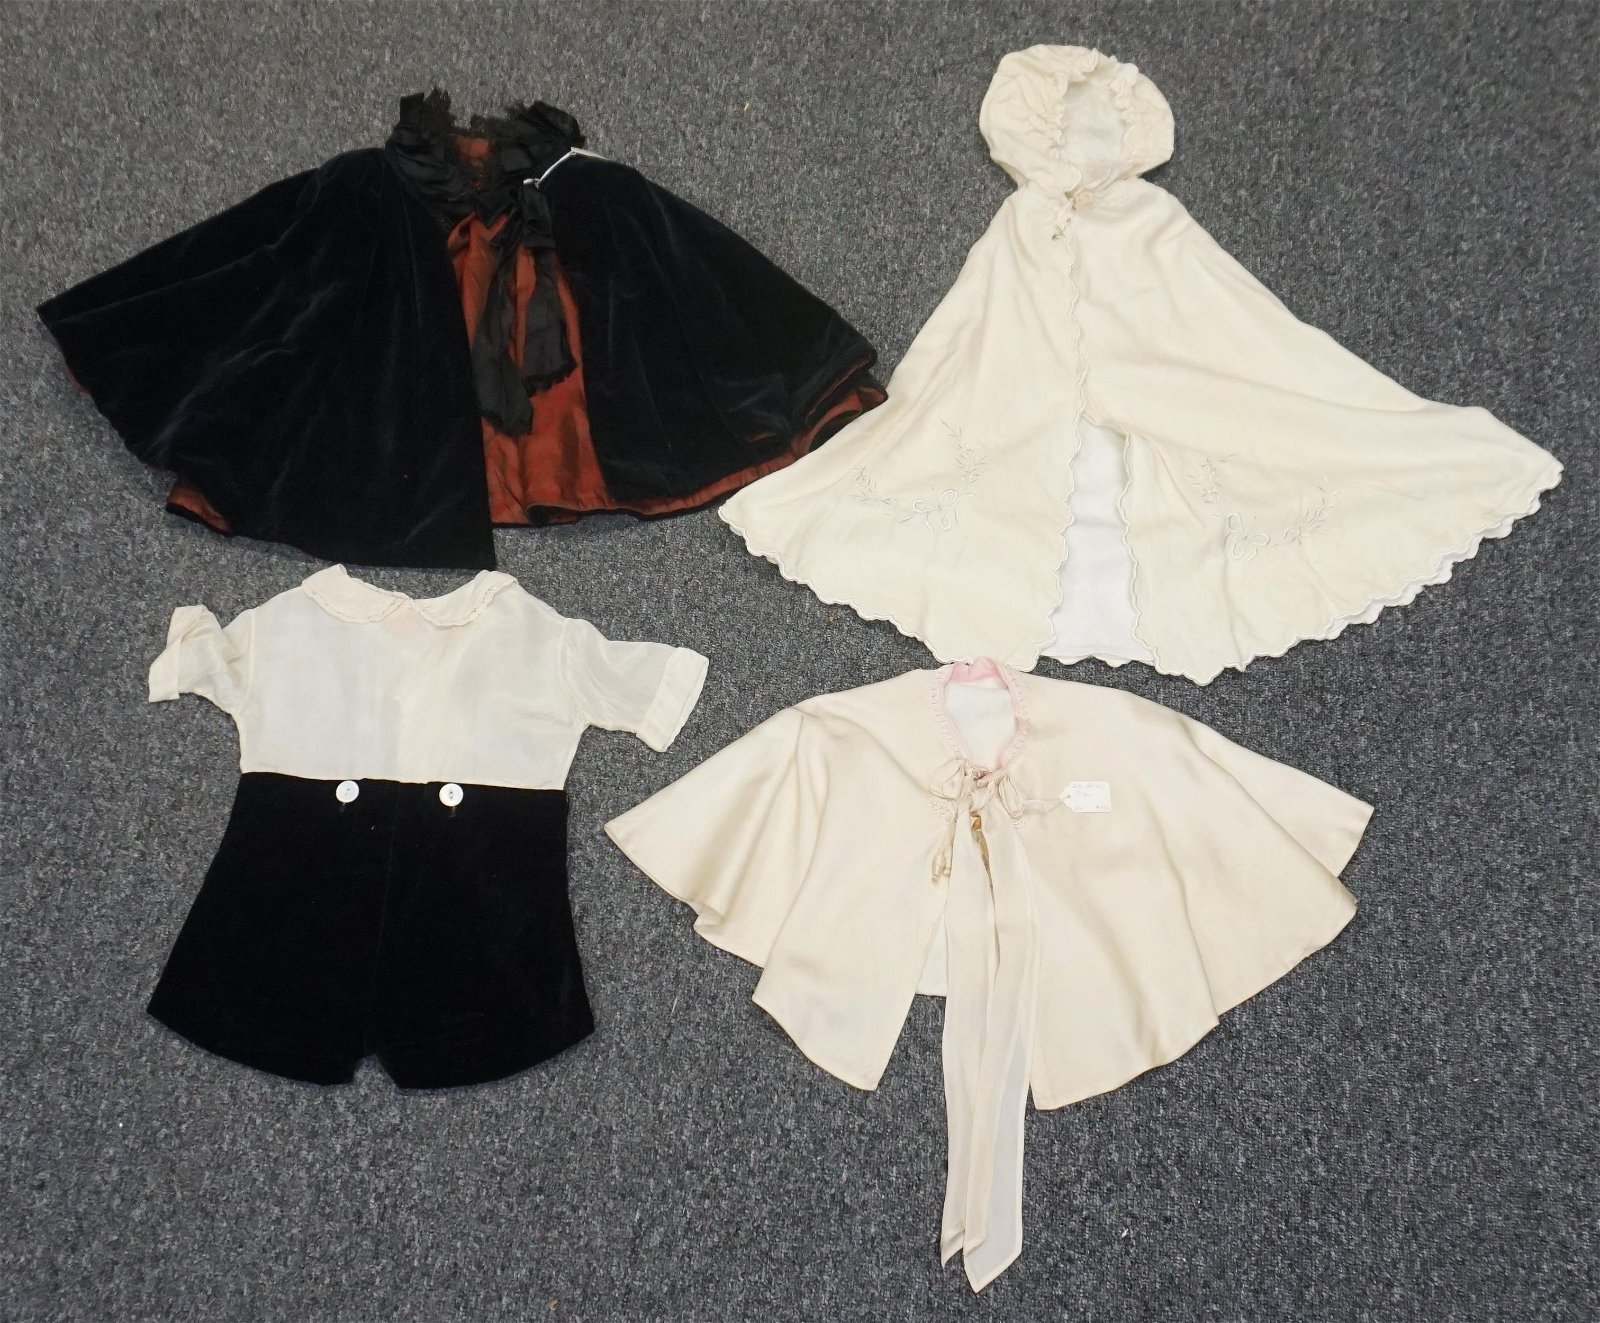 4 VICTORIAN GIRLS & BOYS CLOTHING